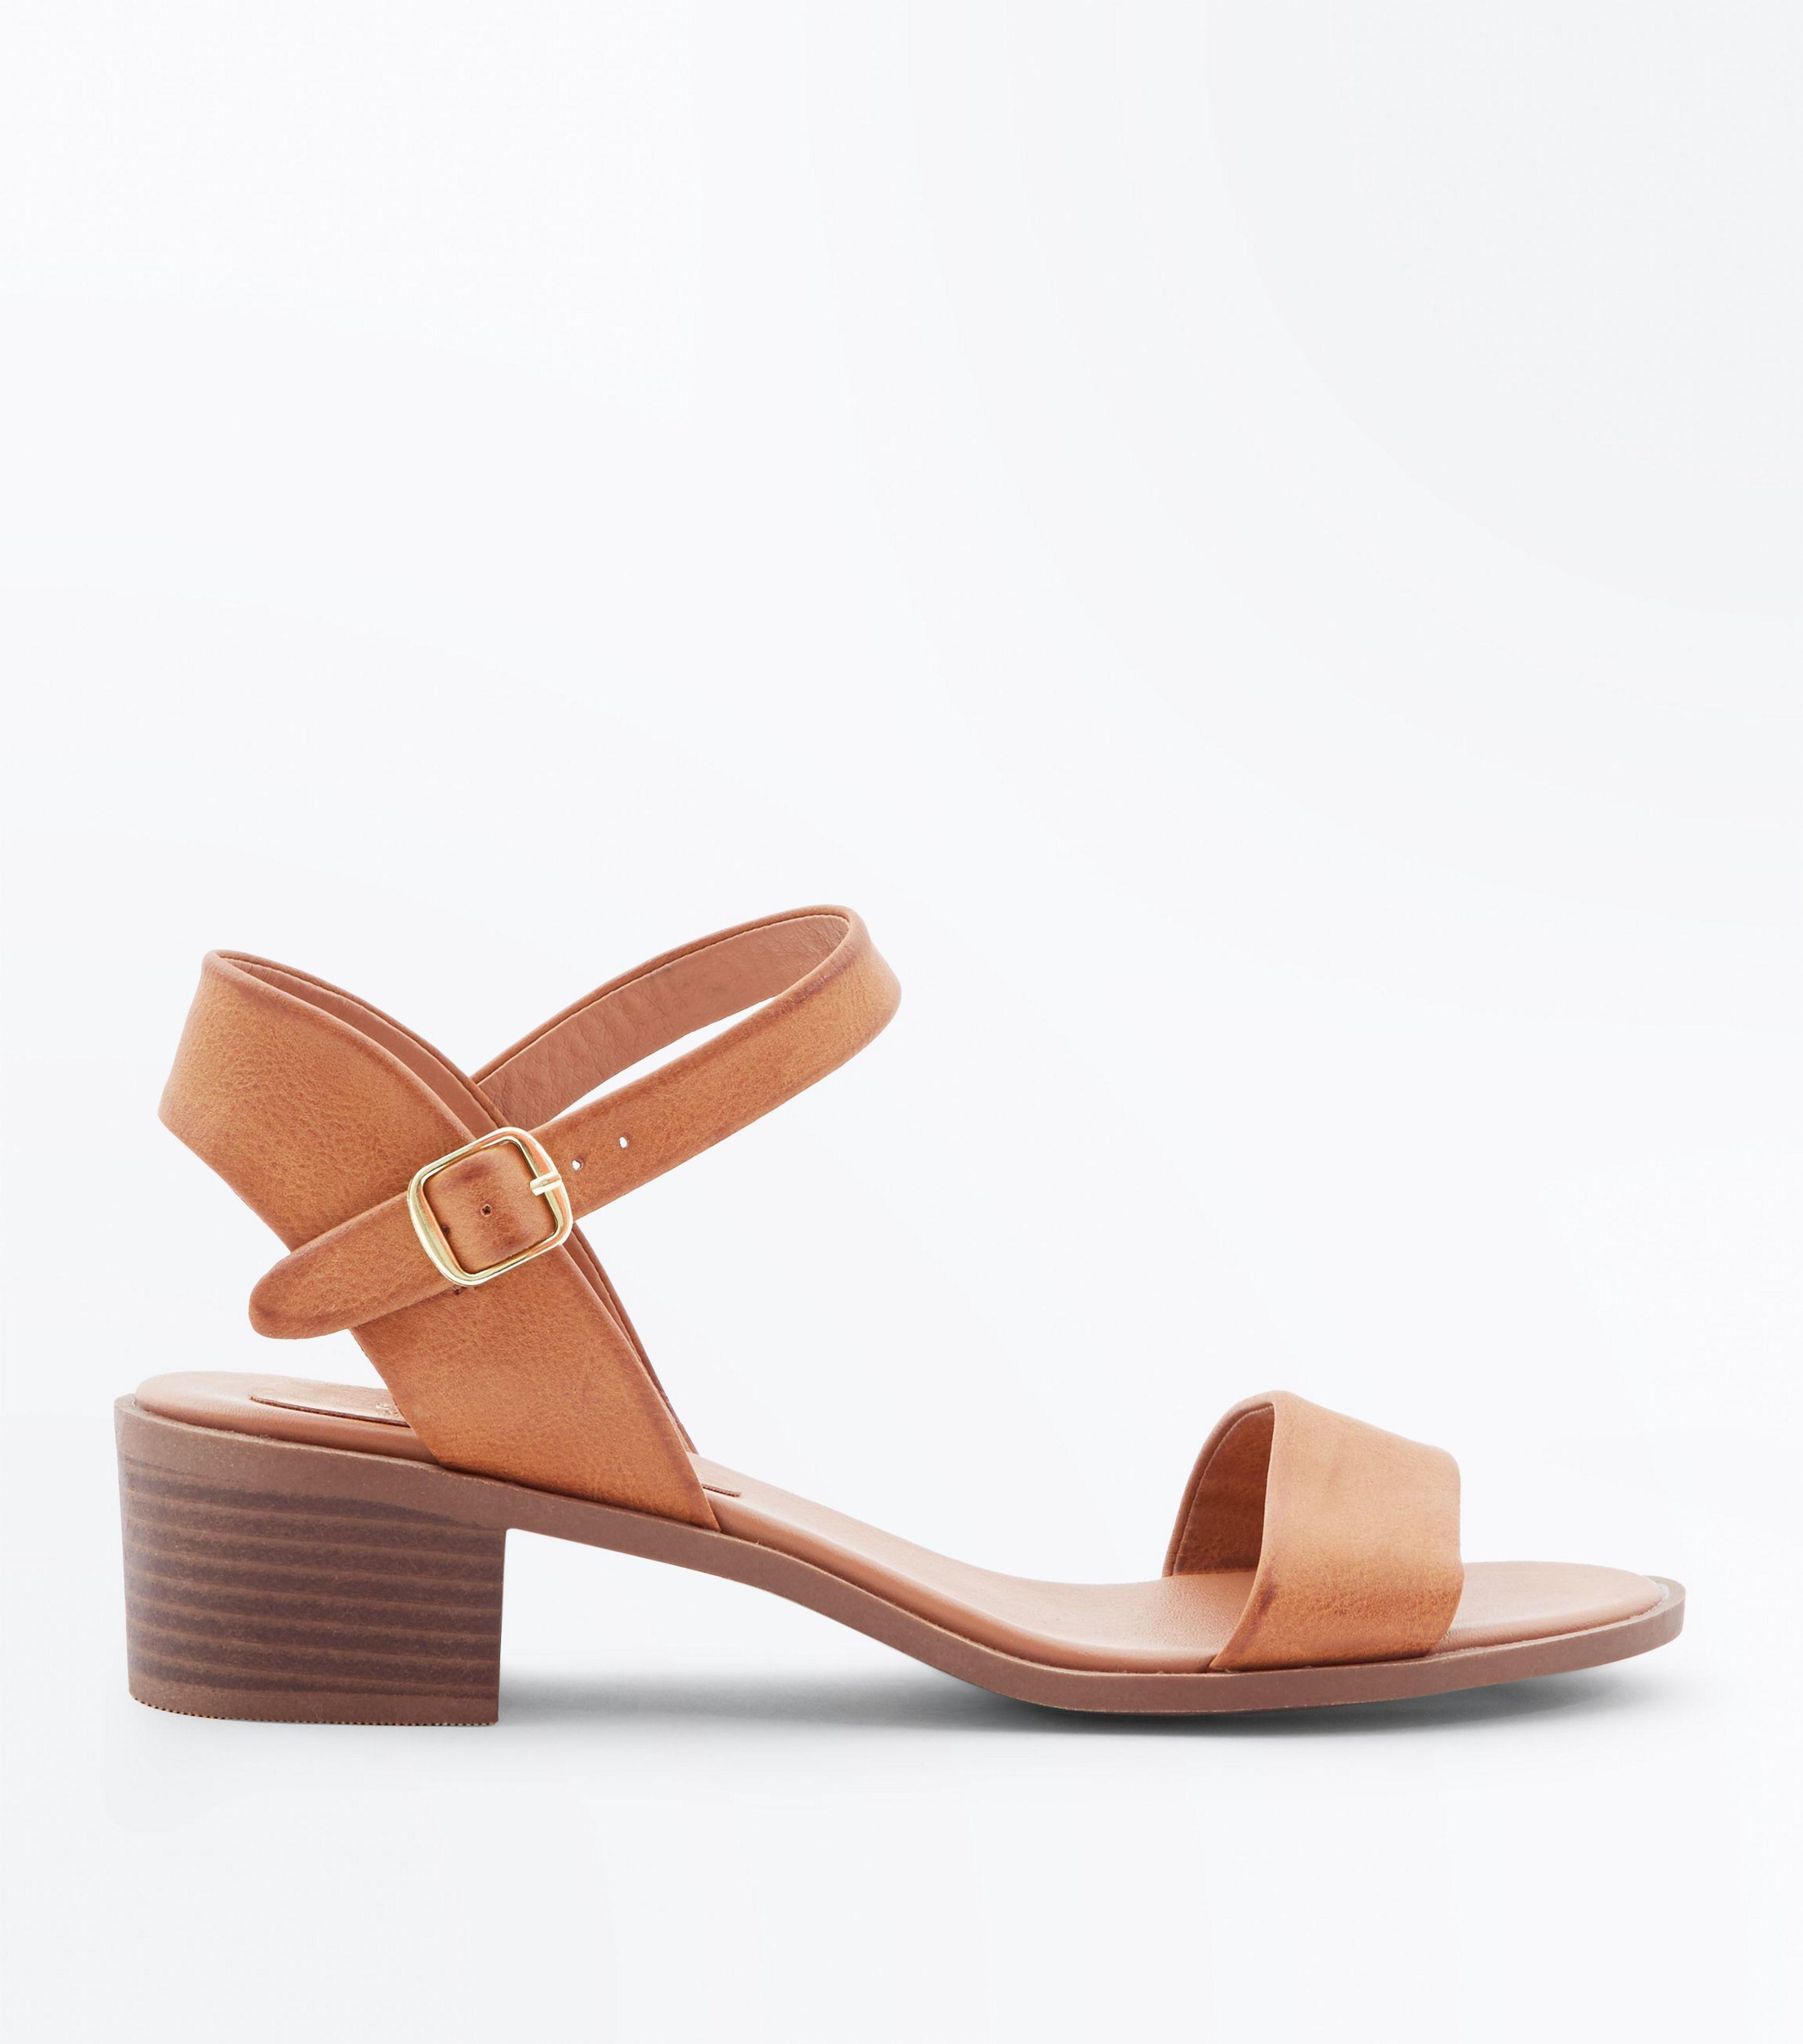 a4dc2cbf5ae New Look Wide Fit Tan Low Block Heel Sandals in Brown - Lyst